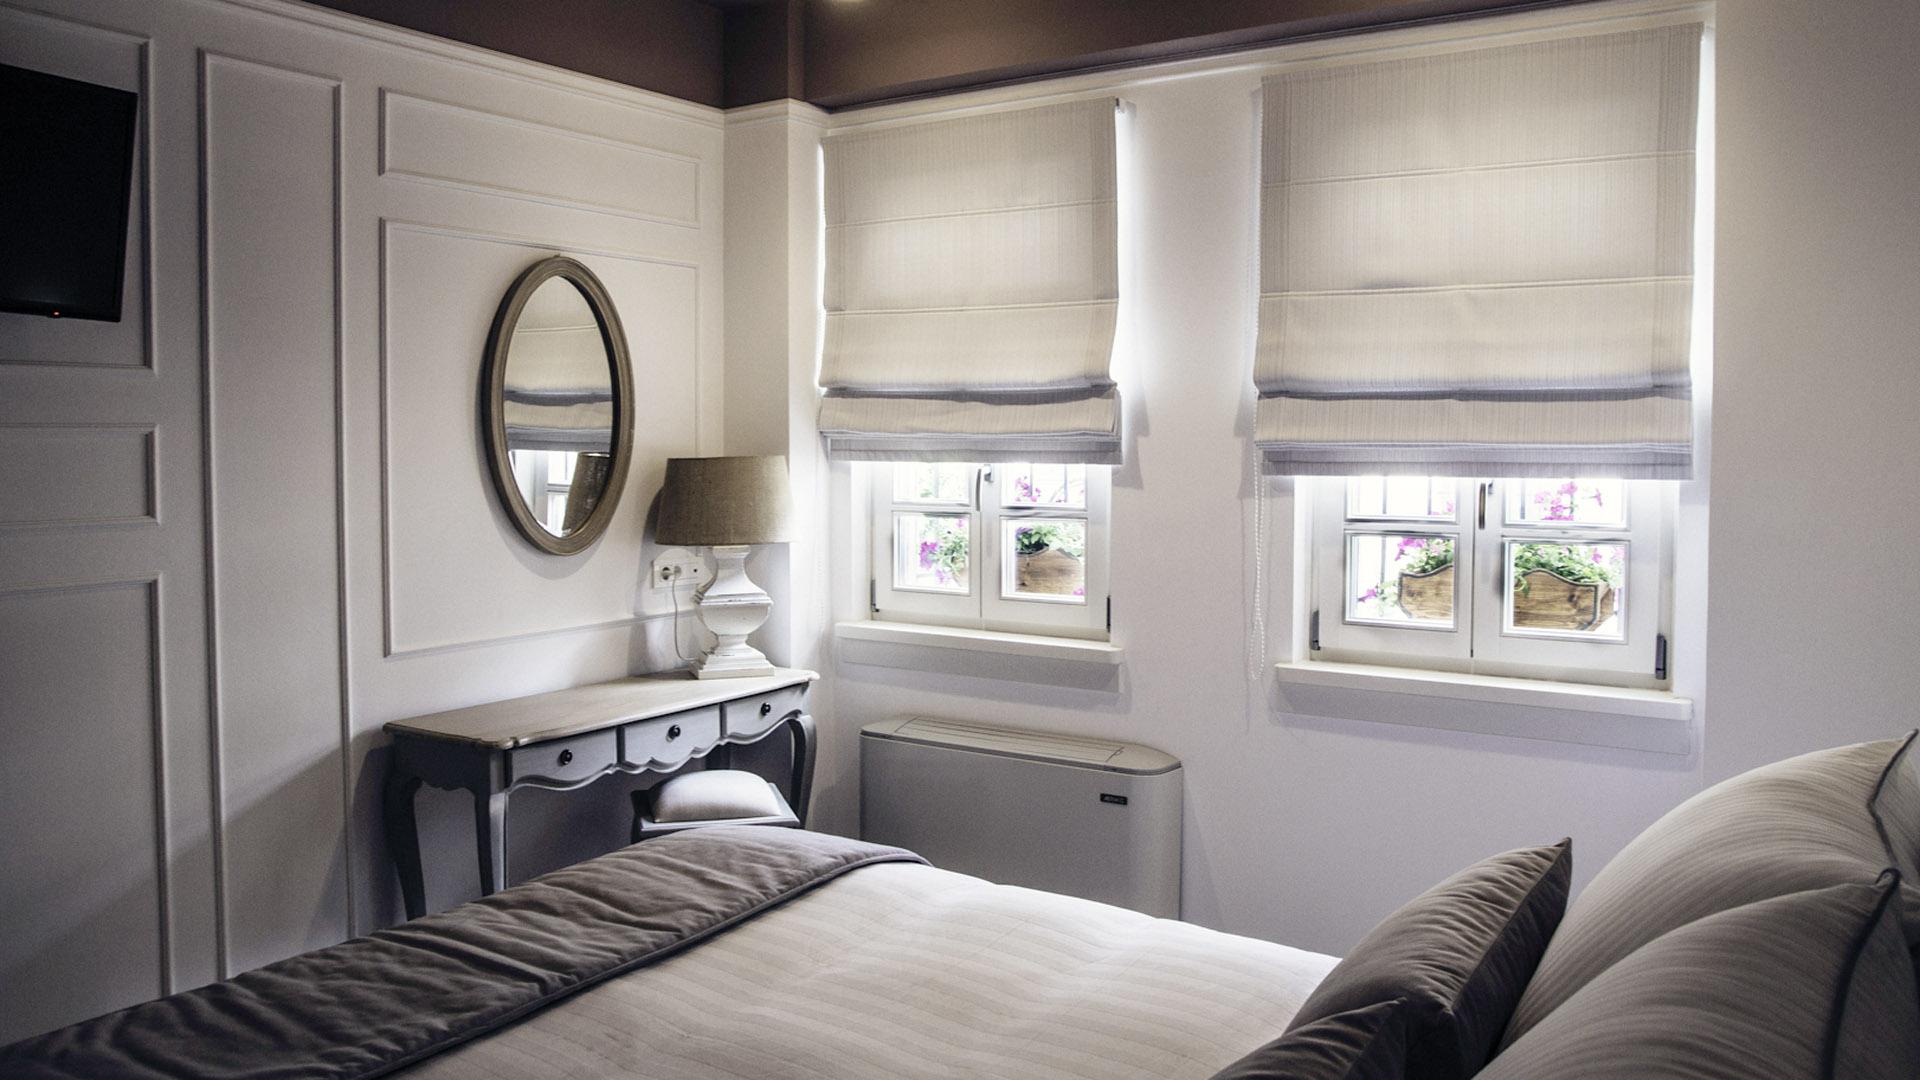 http://itskale-hotel.gr/demo/wp-content/uploads/2013/10/DSC04516.jpg